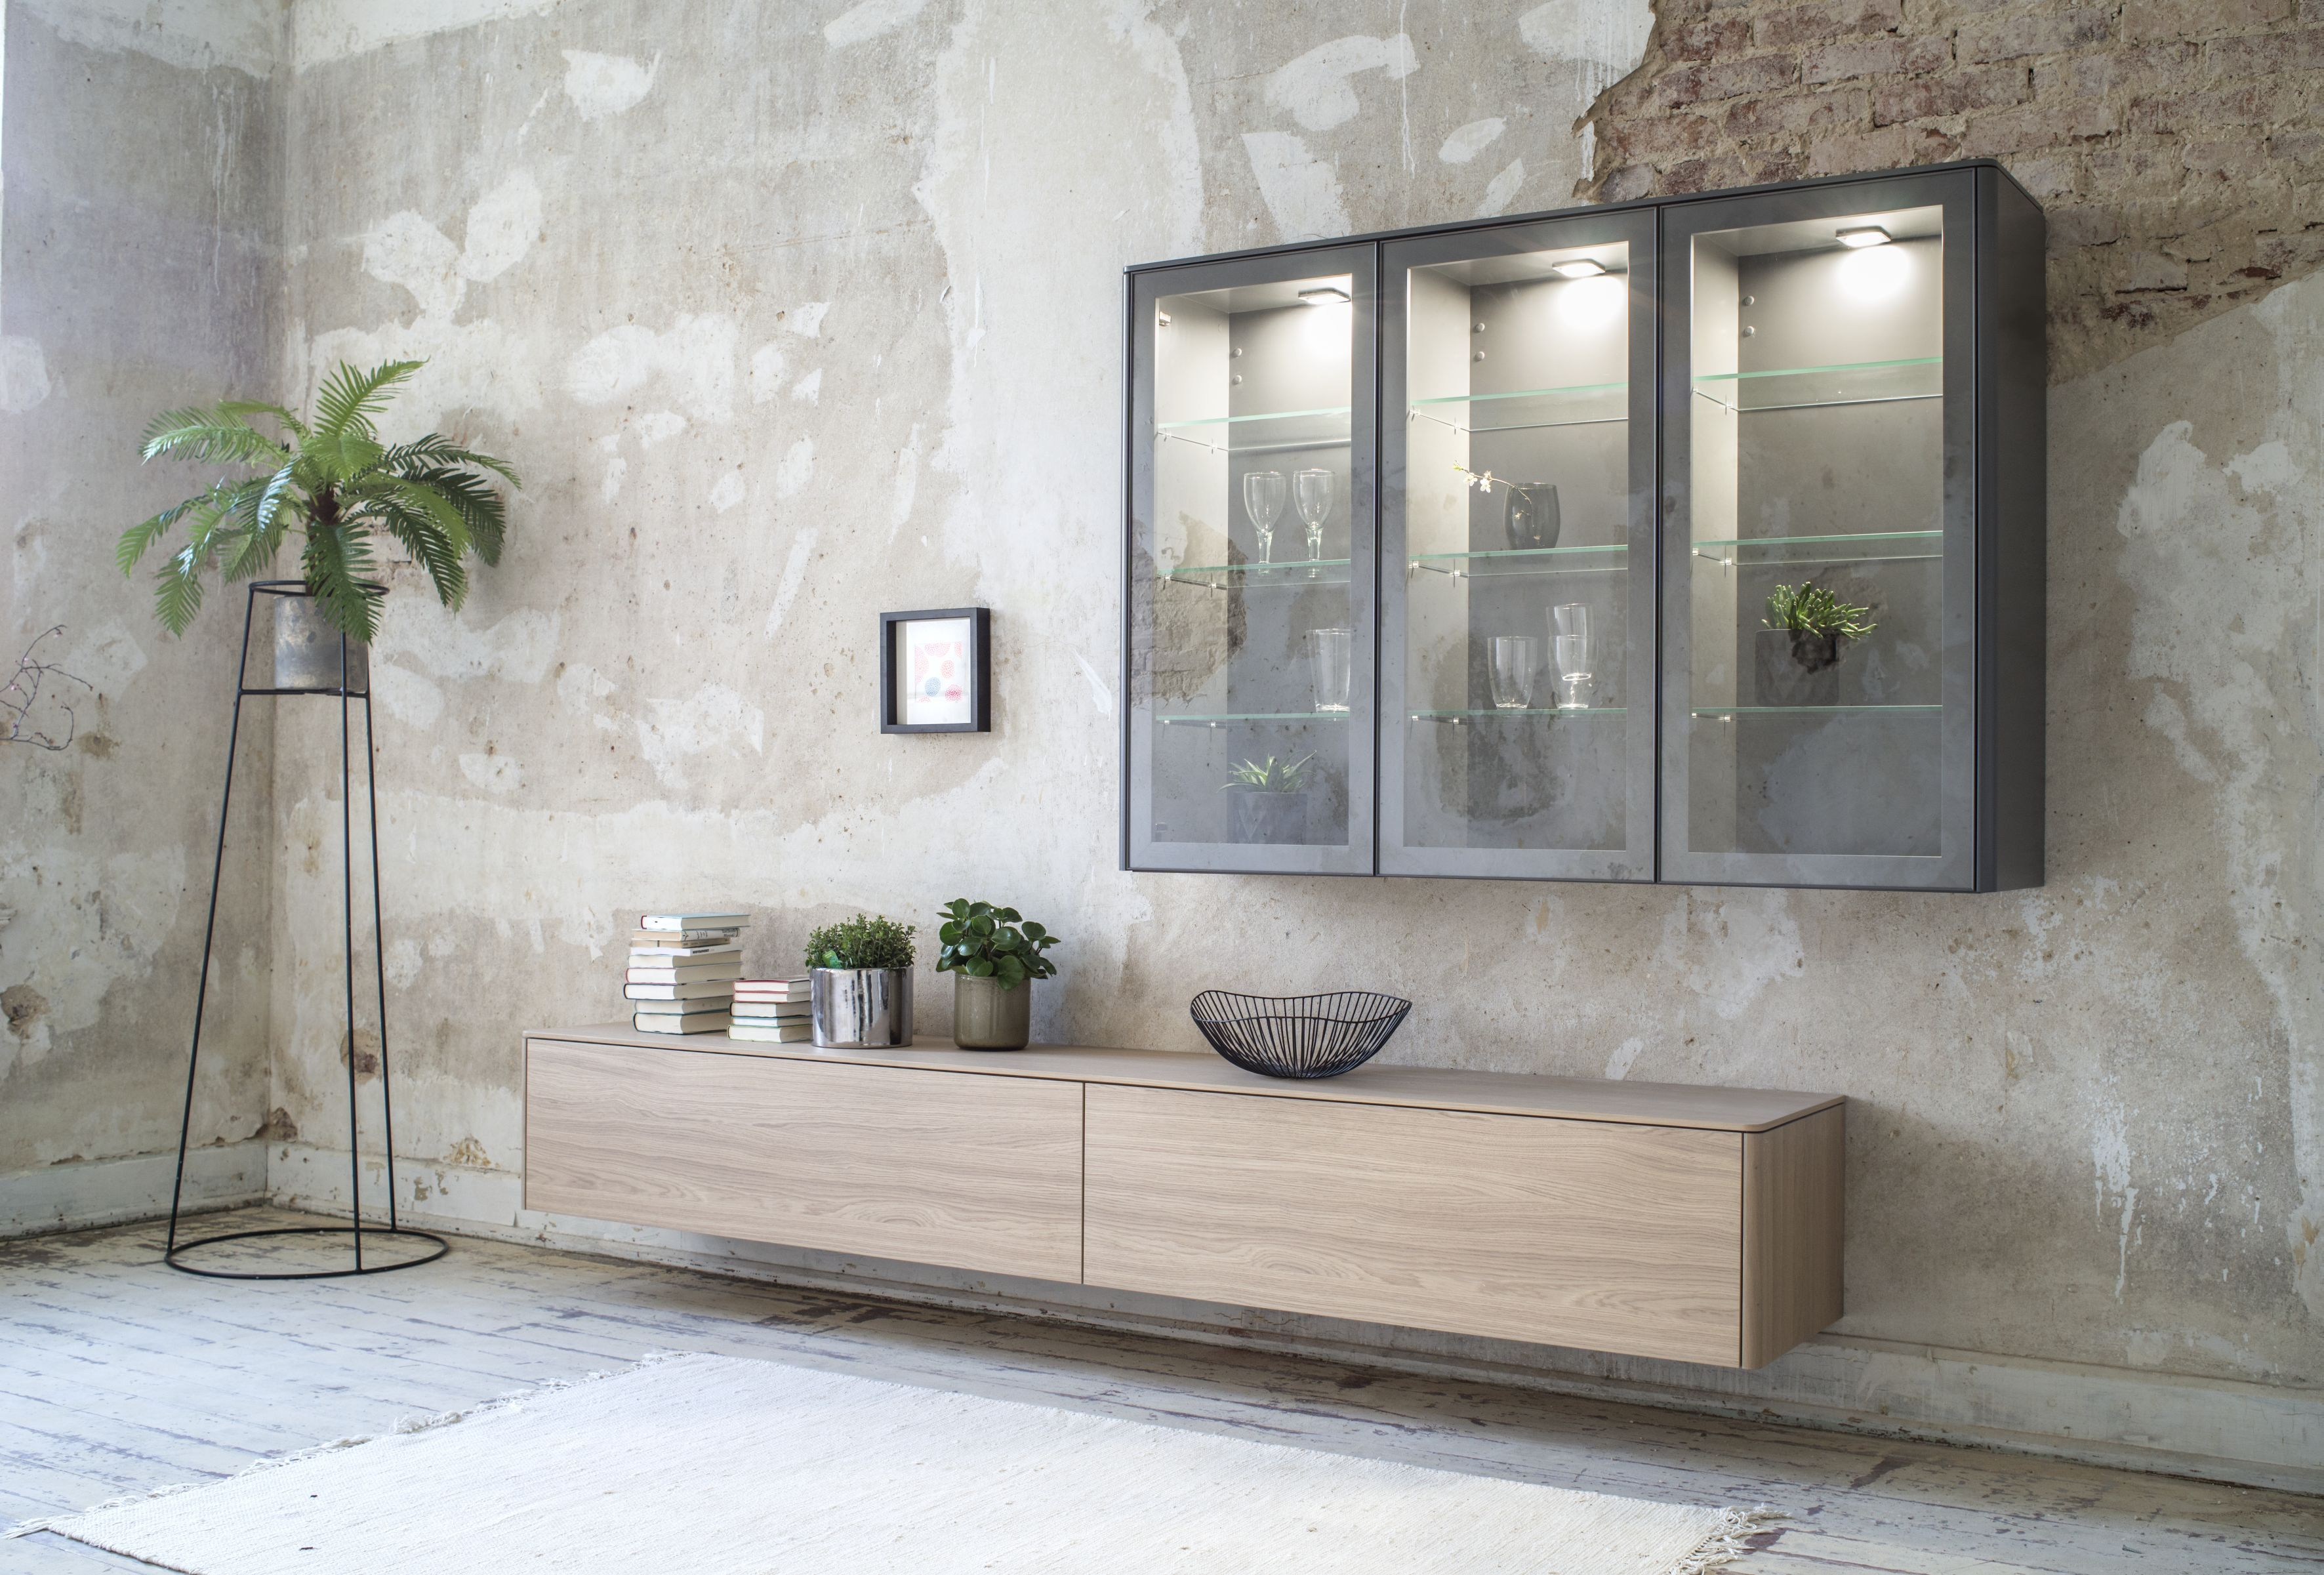 GOYA Sideboard | #Sideboard aus Glas, Lack und edlem Echtholzfurnier ...